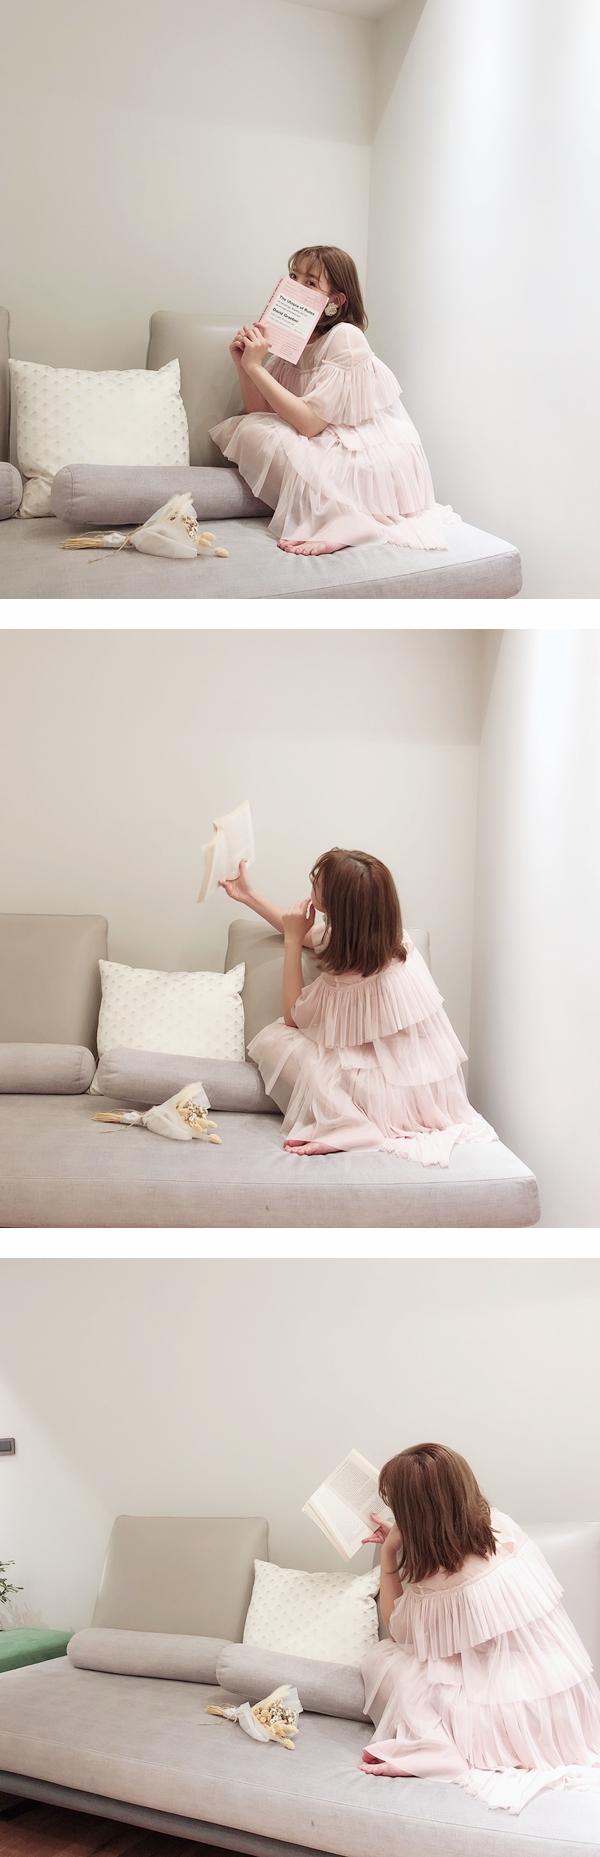 PAZZO_浪漫氛圍網紗多層荷葉洋裝2.jpg